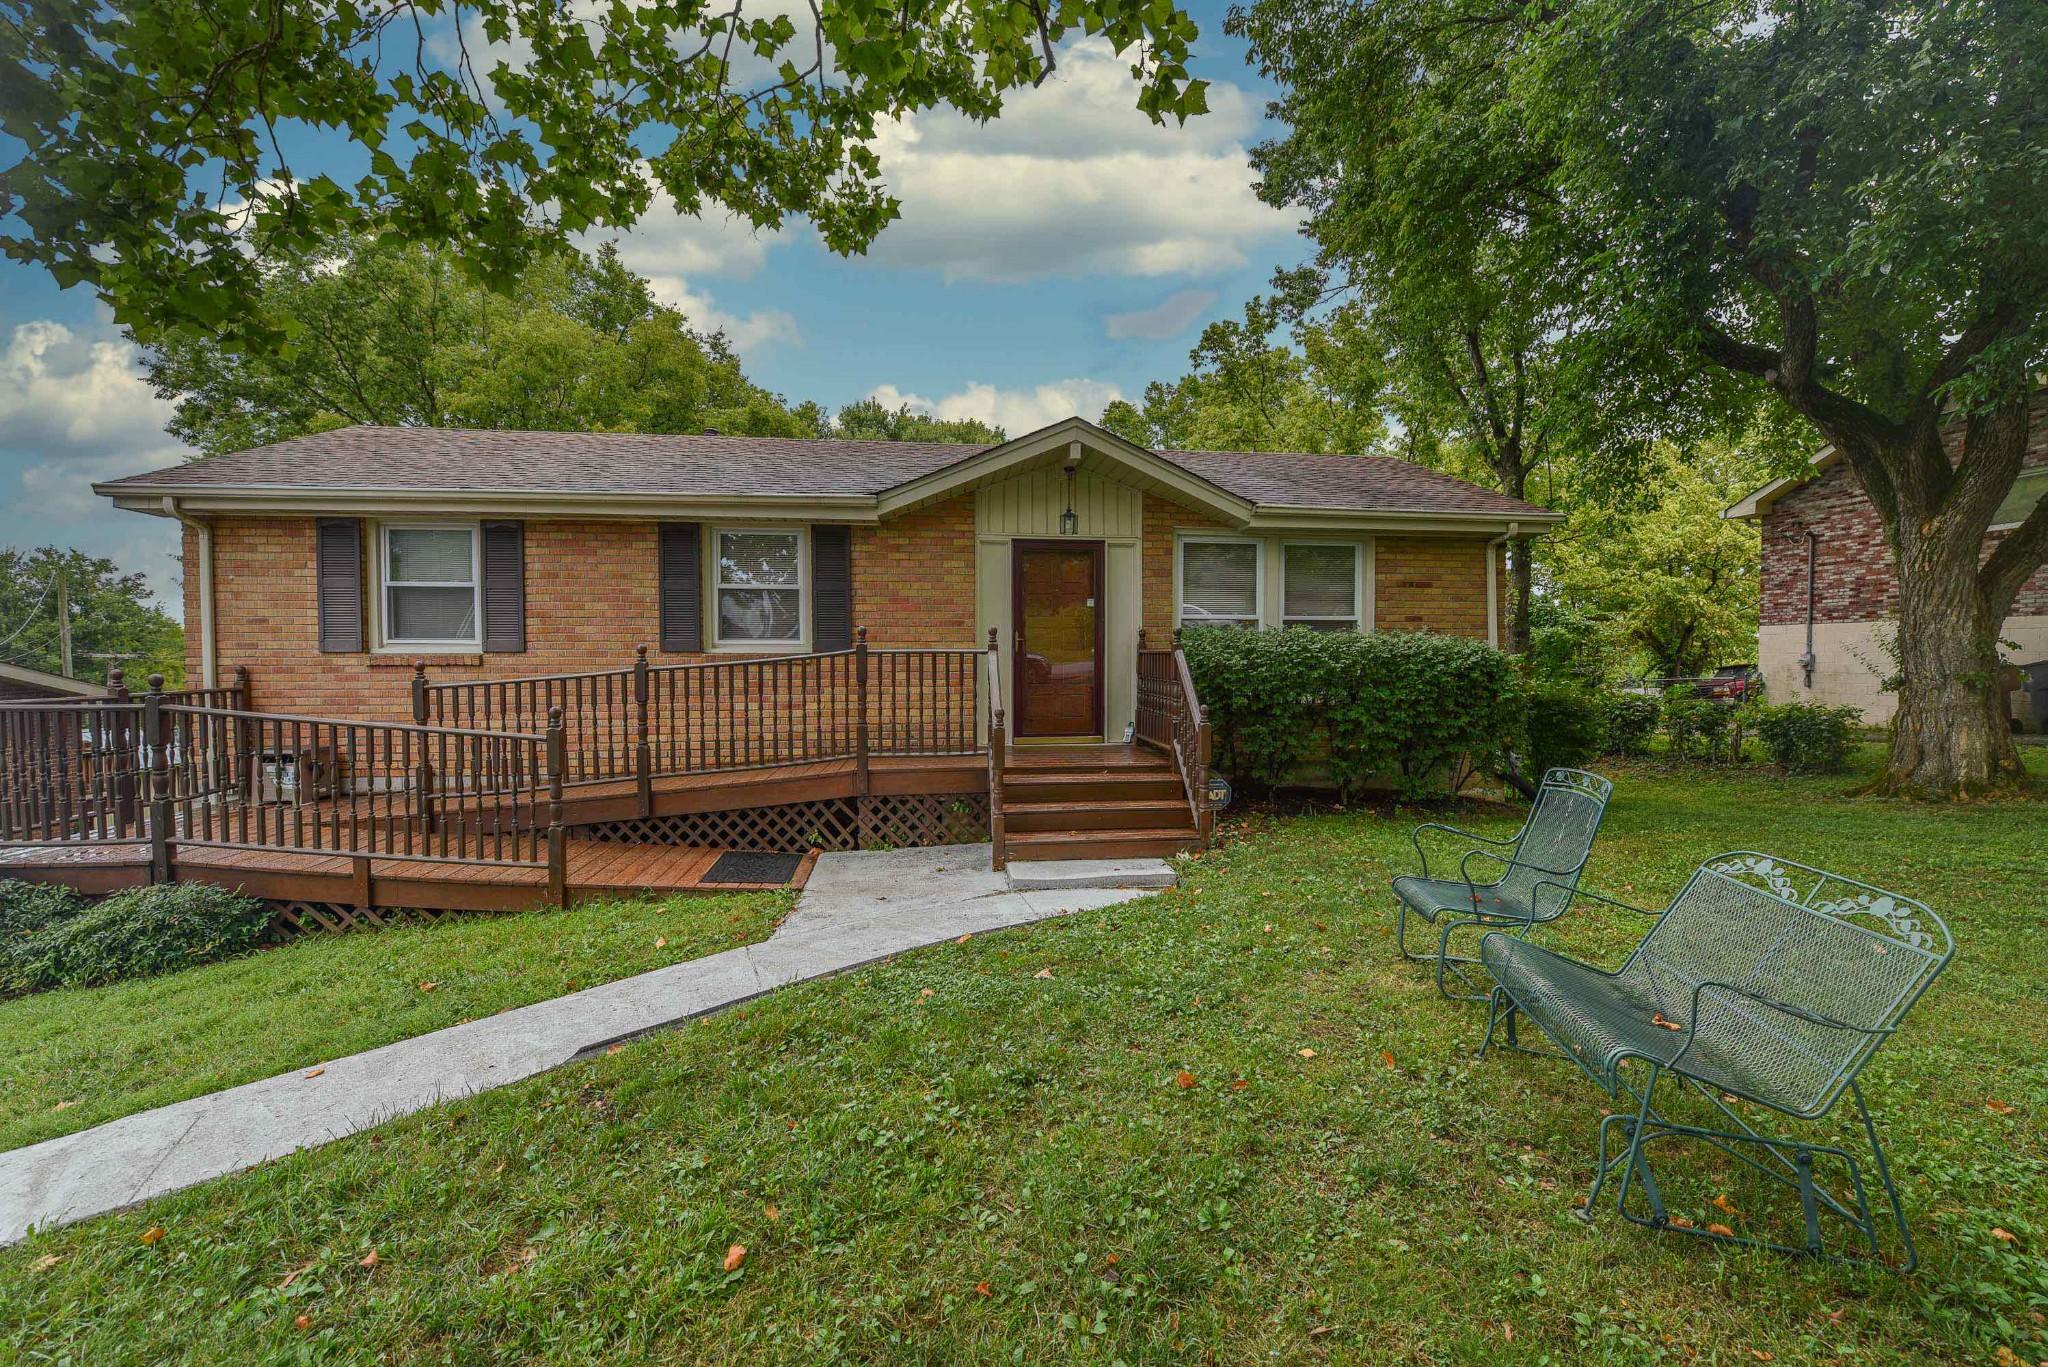 428 Mercomatic Dr Property Photo - Nashville, TN real estate listing